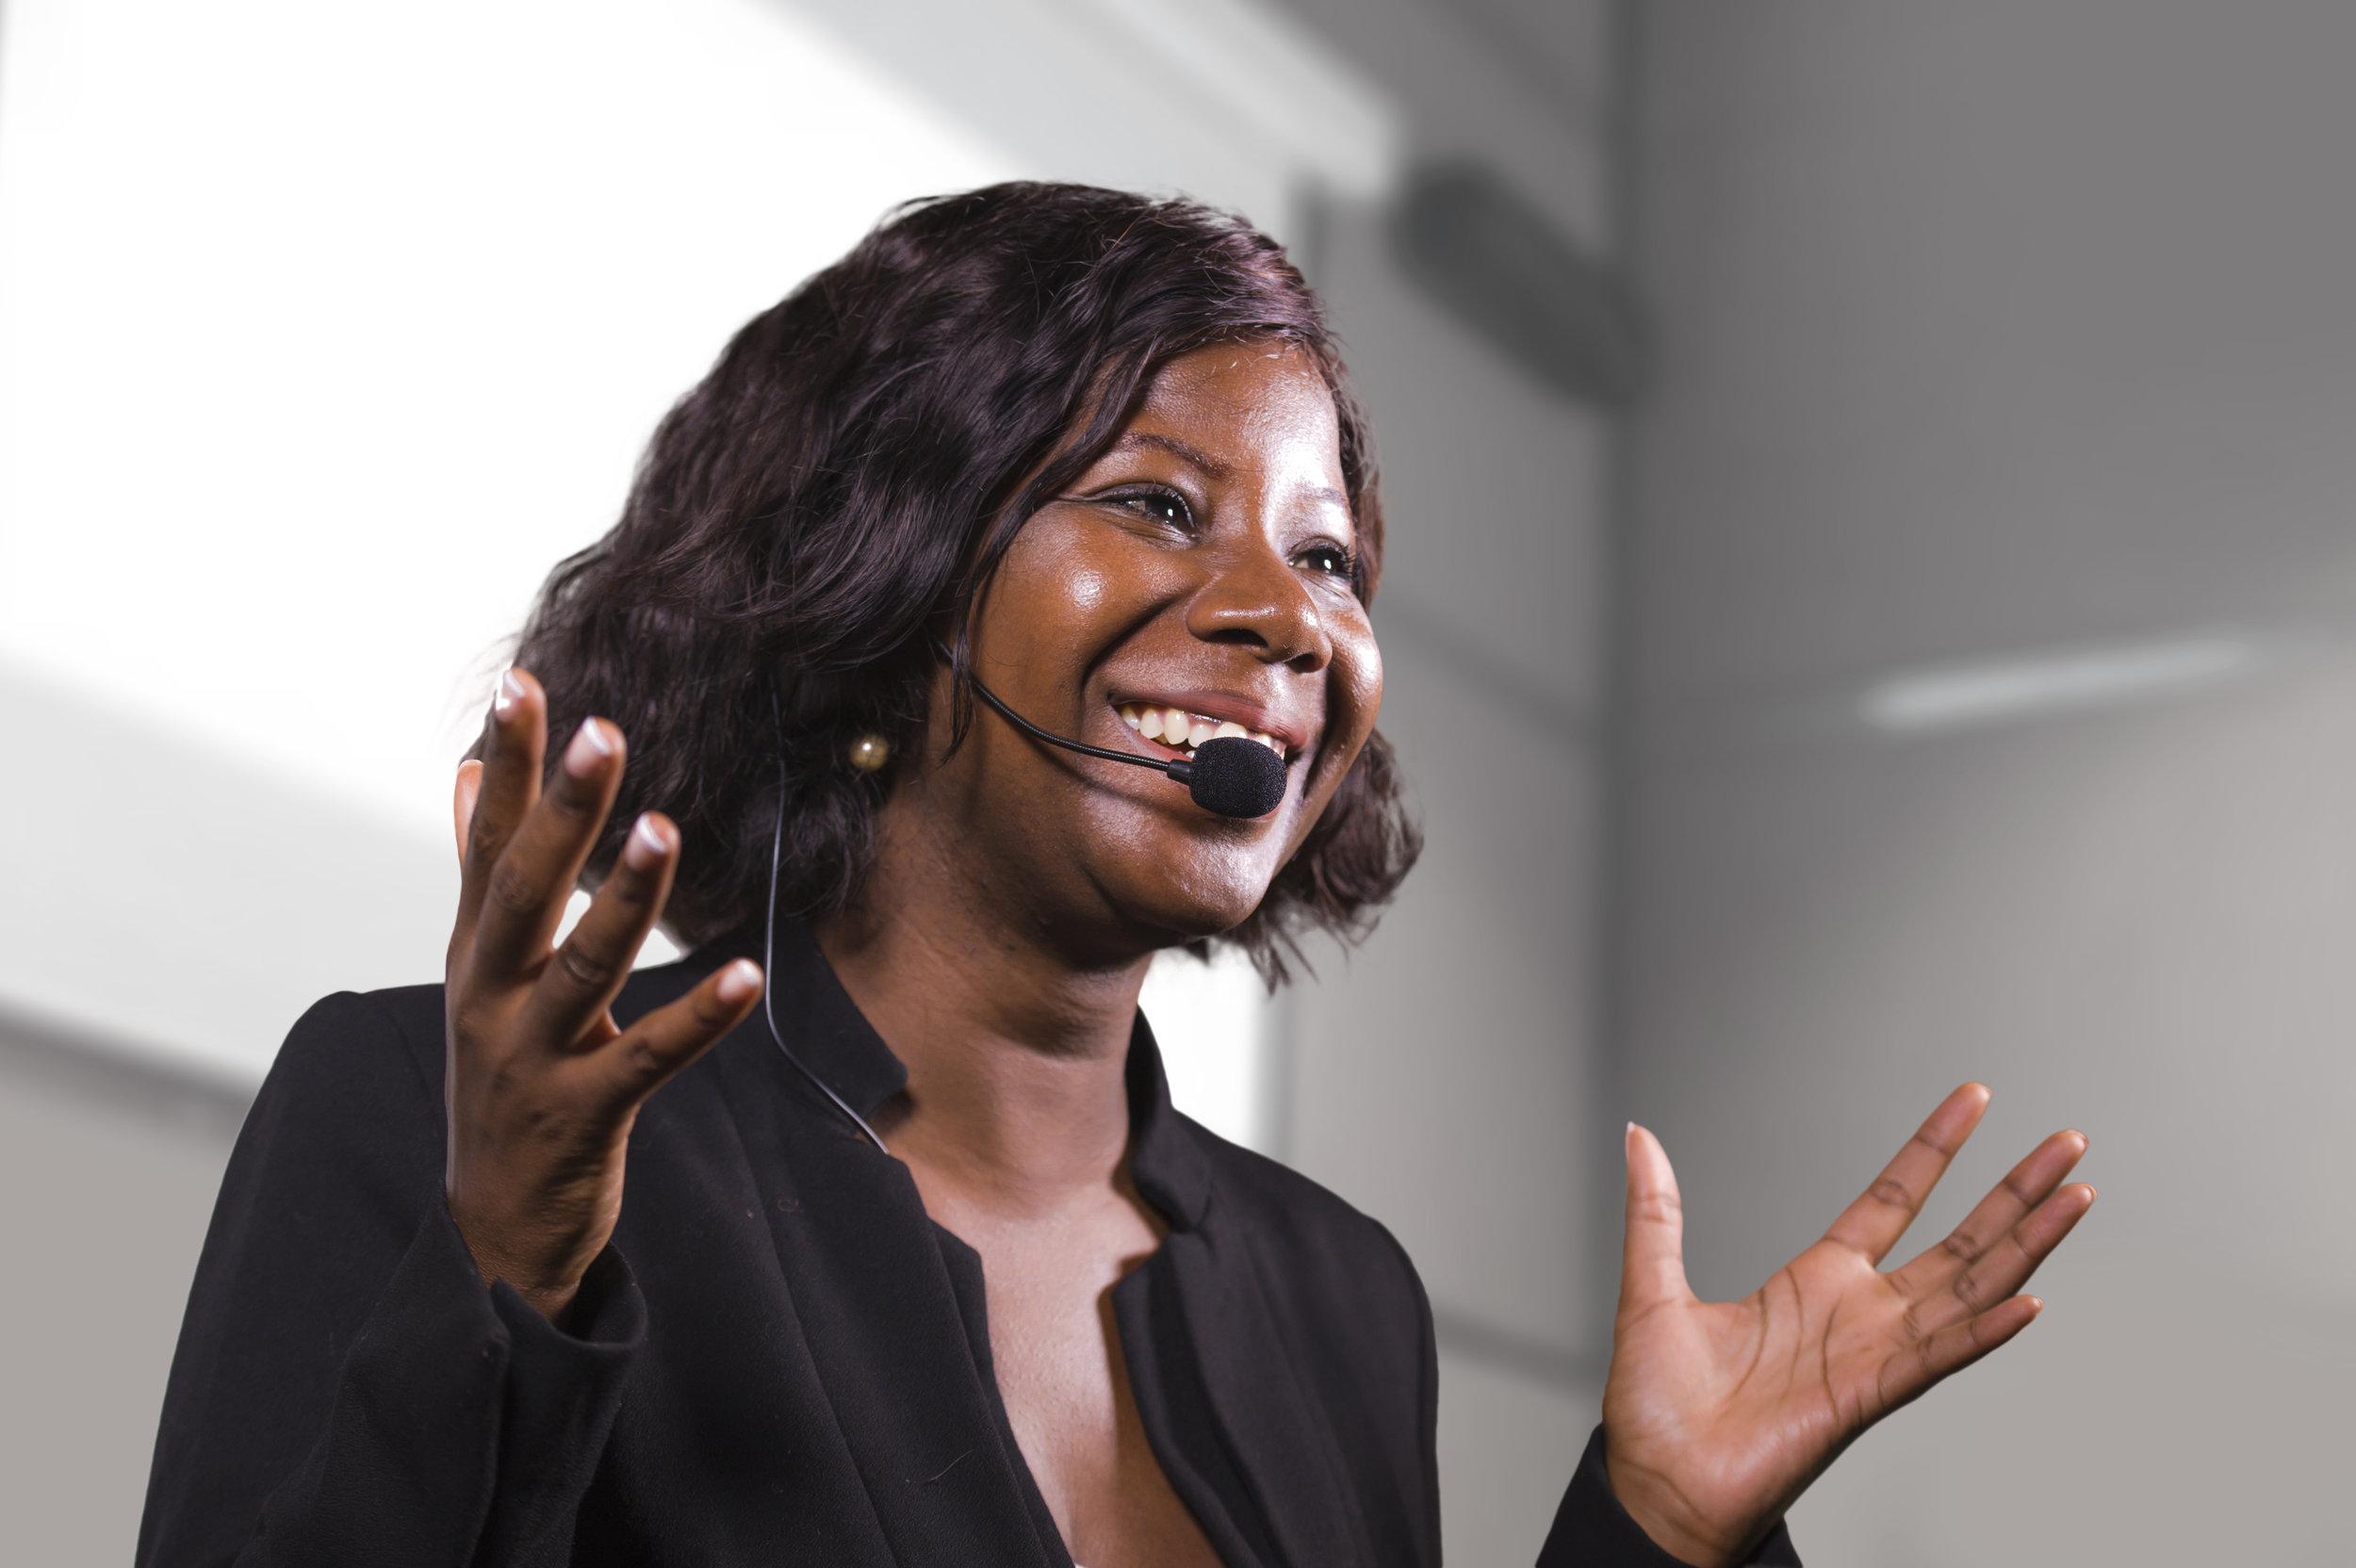 Black woman_Conference_255661474.jpeg